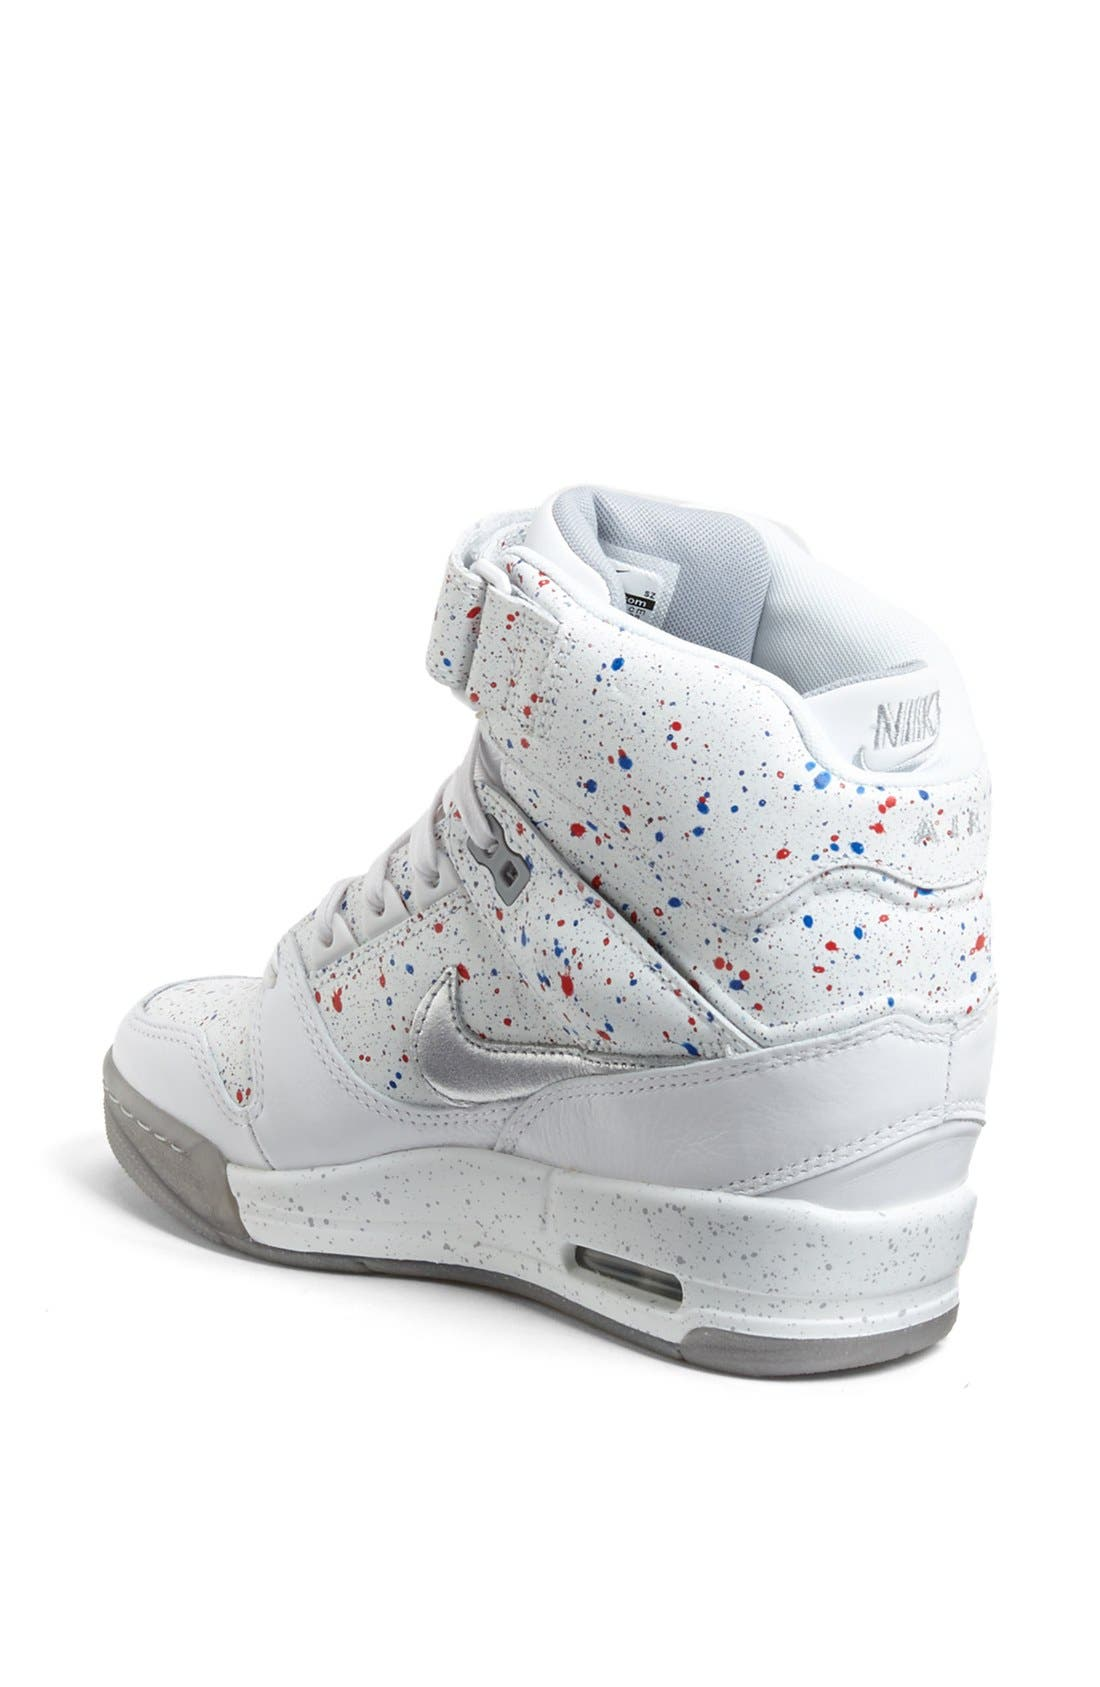 Alternate Image 2  - Nike 'Air Revolution Sky Hi' Hidden Wedge Sneaker (Women)